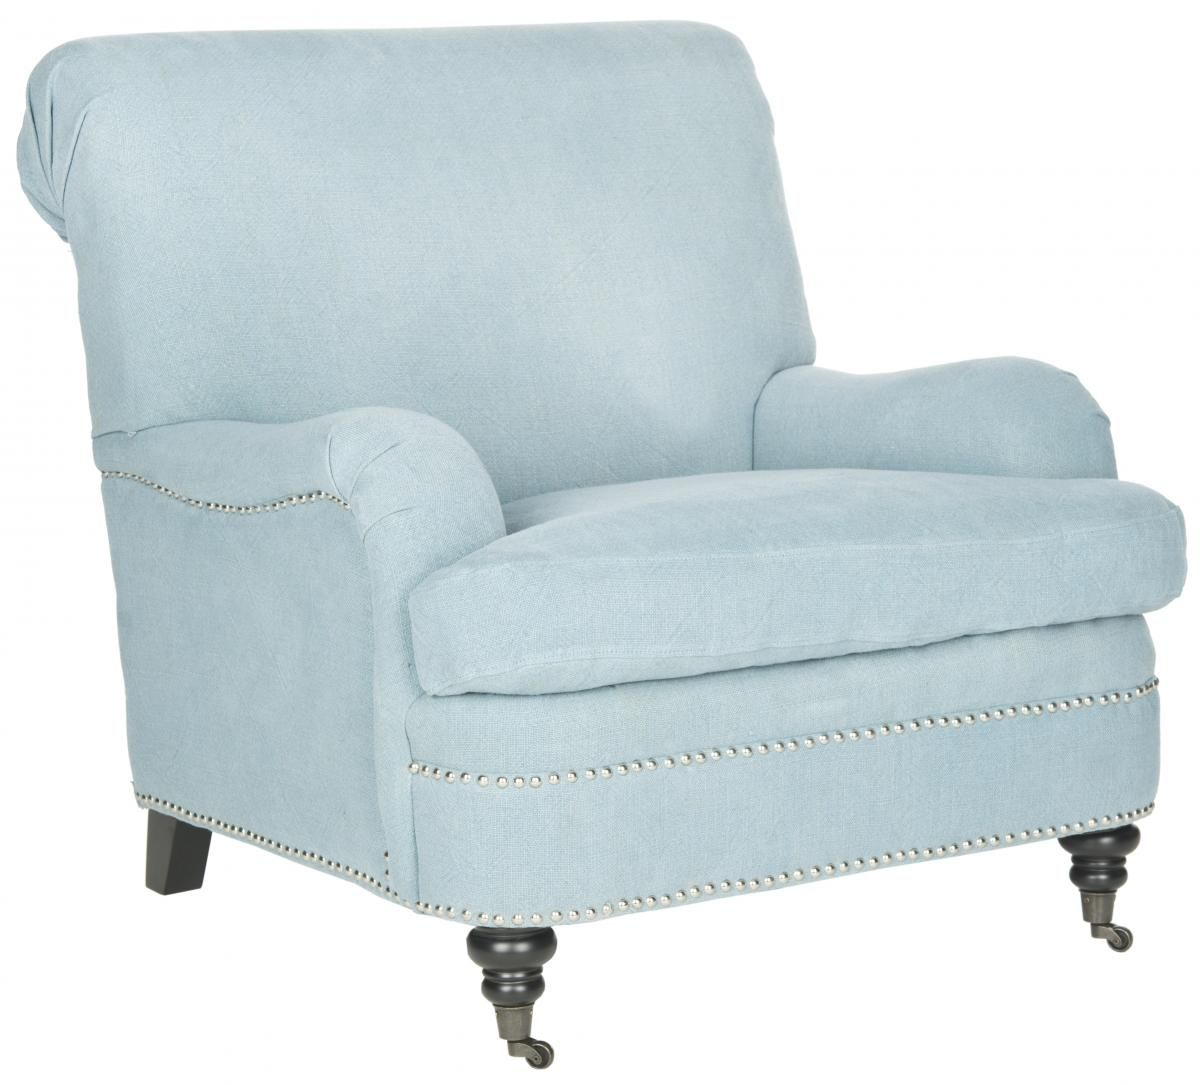 Pale Blue Velvet Chair Google Search Club Chairs Furniture